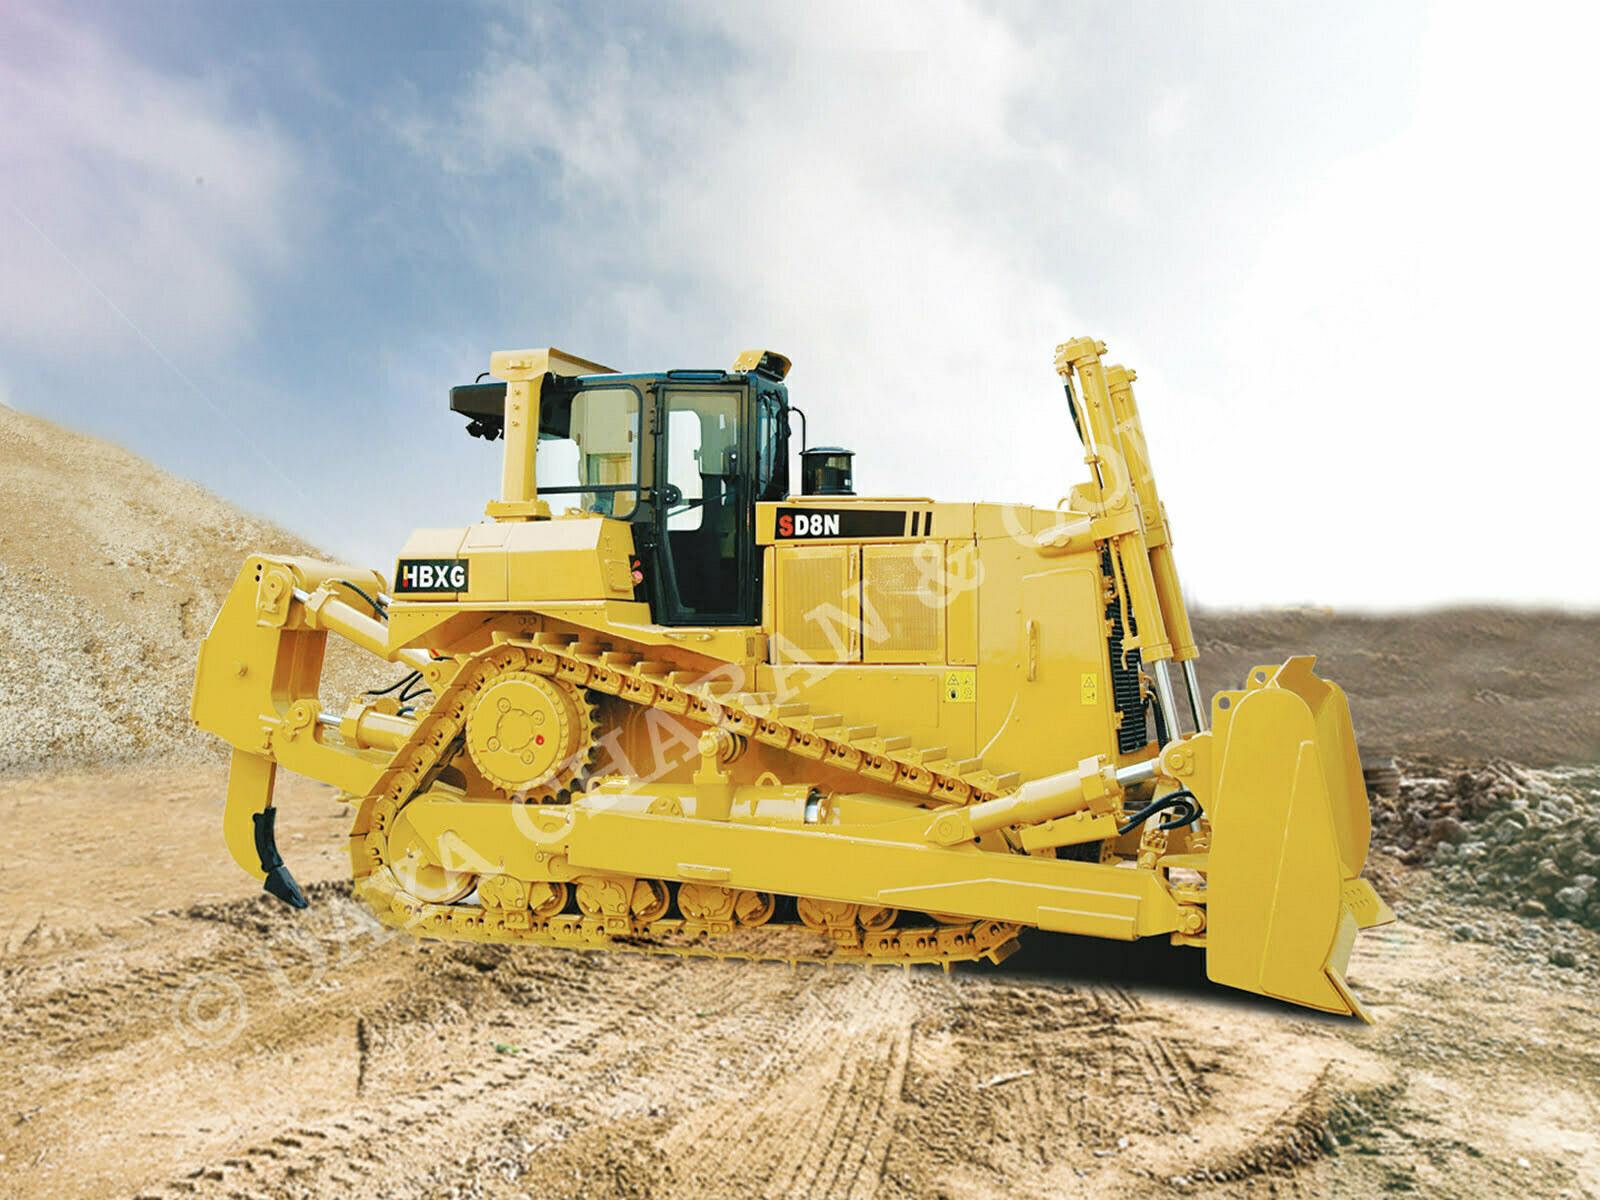 SD8N bulldozer